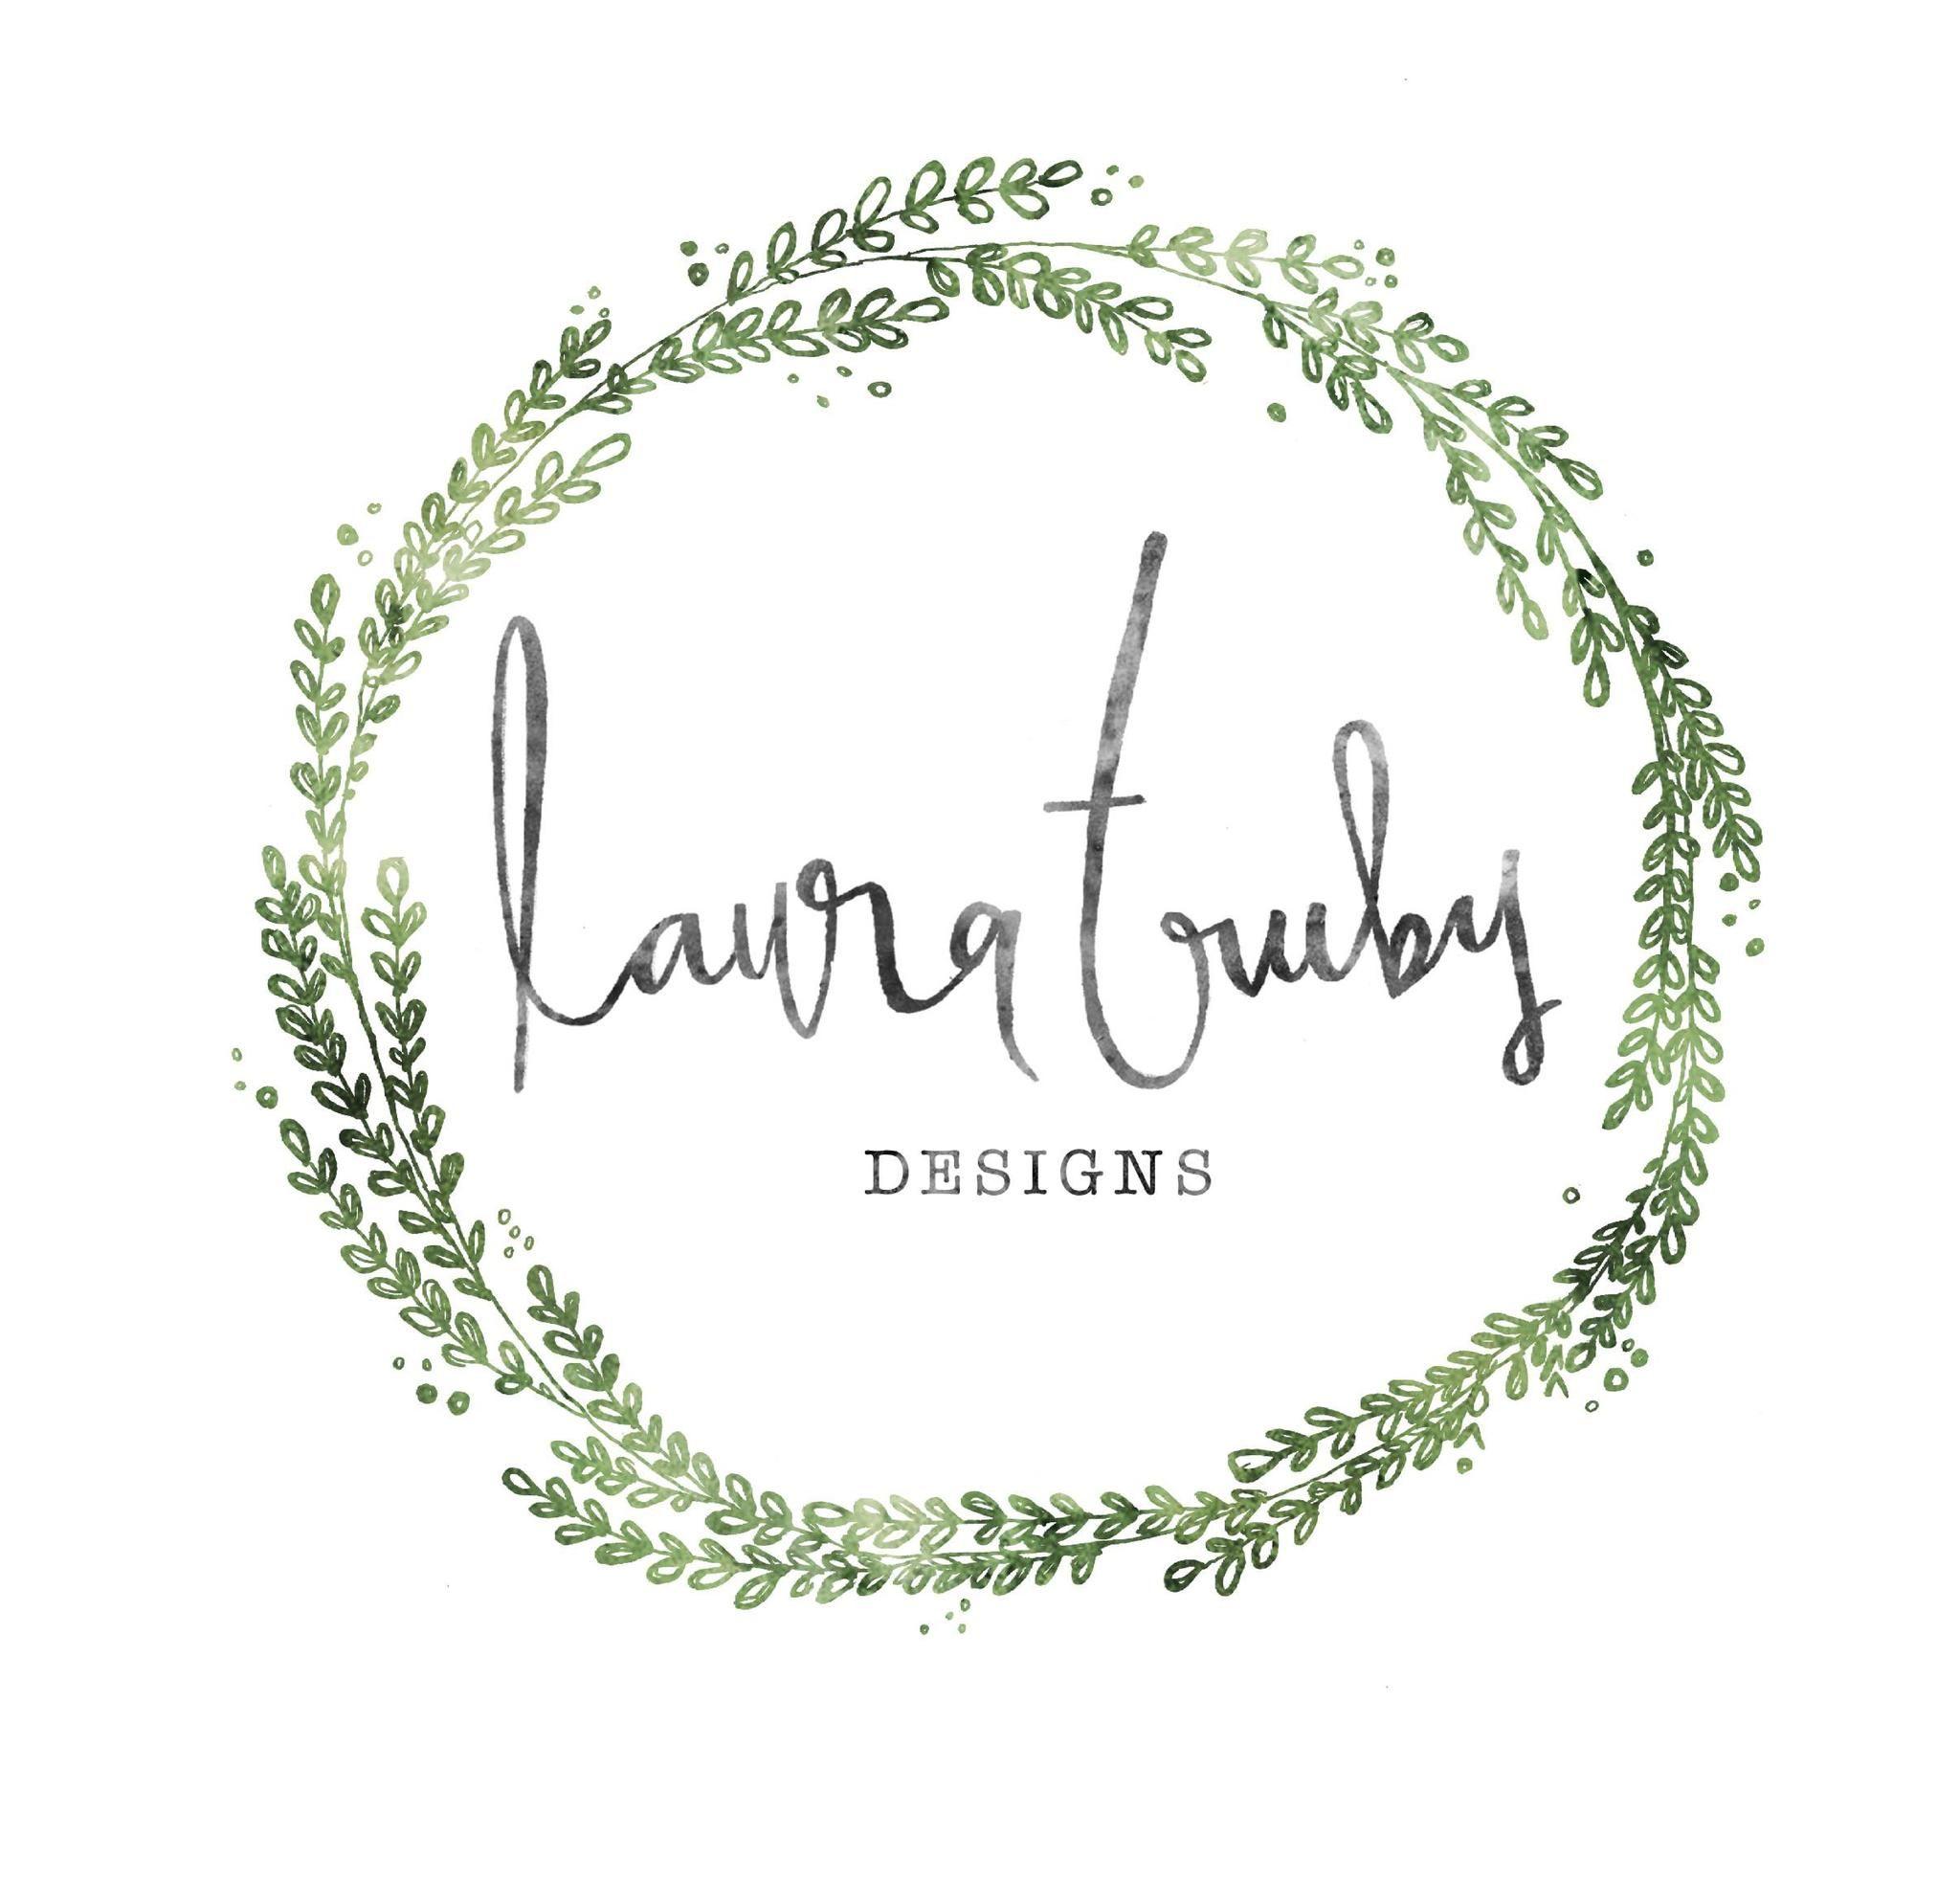 Laura Truby Designs